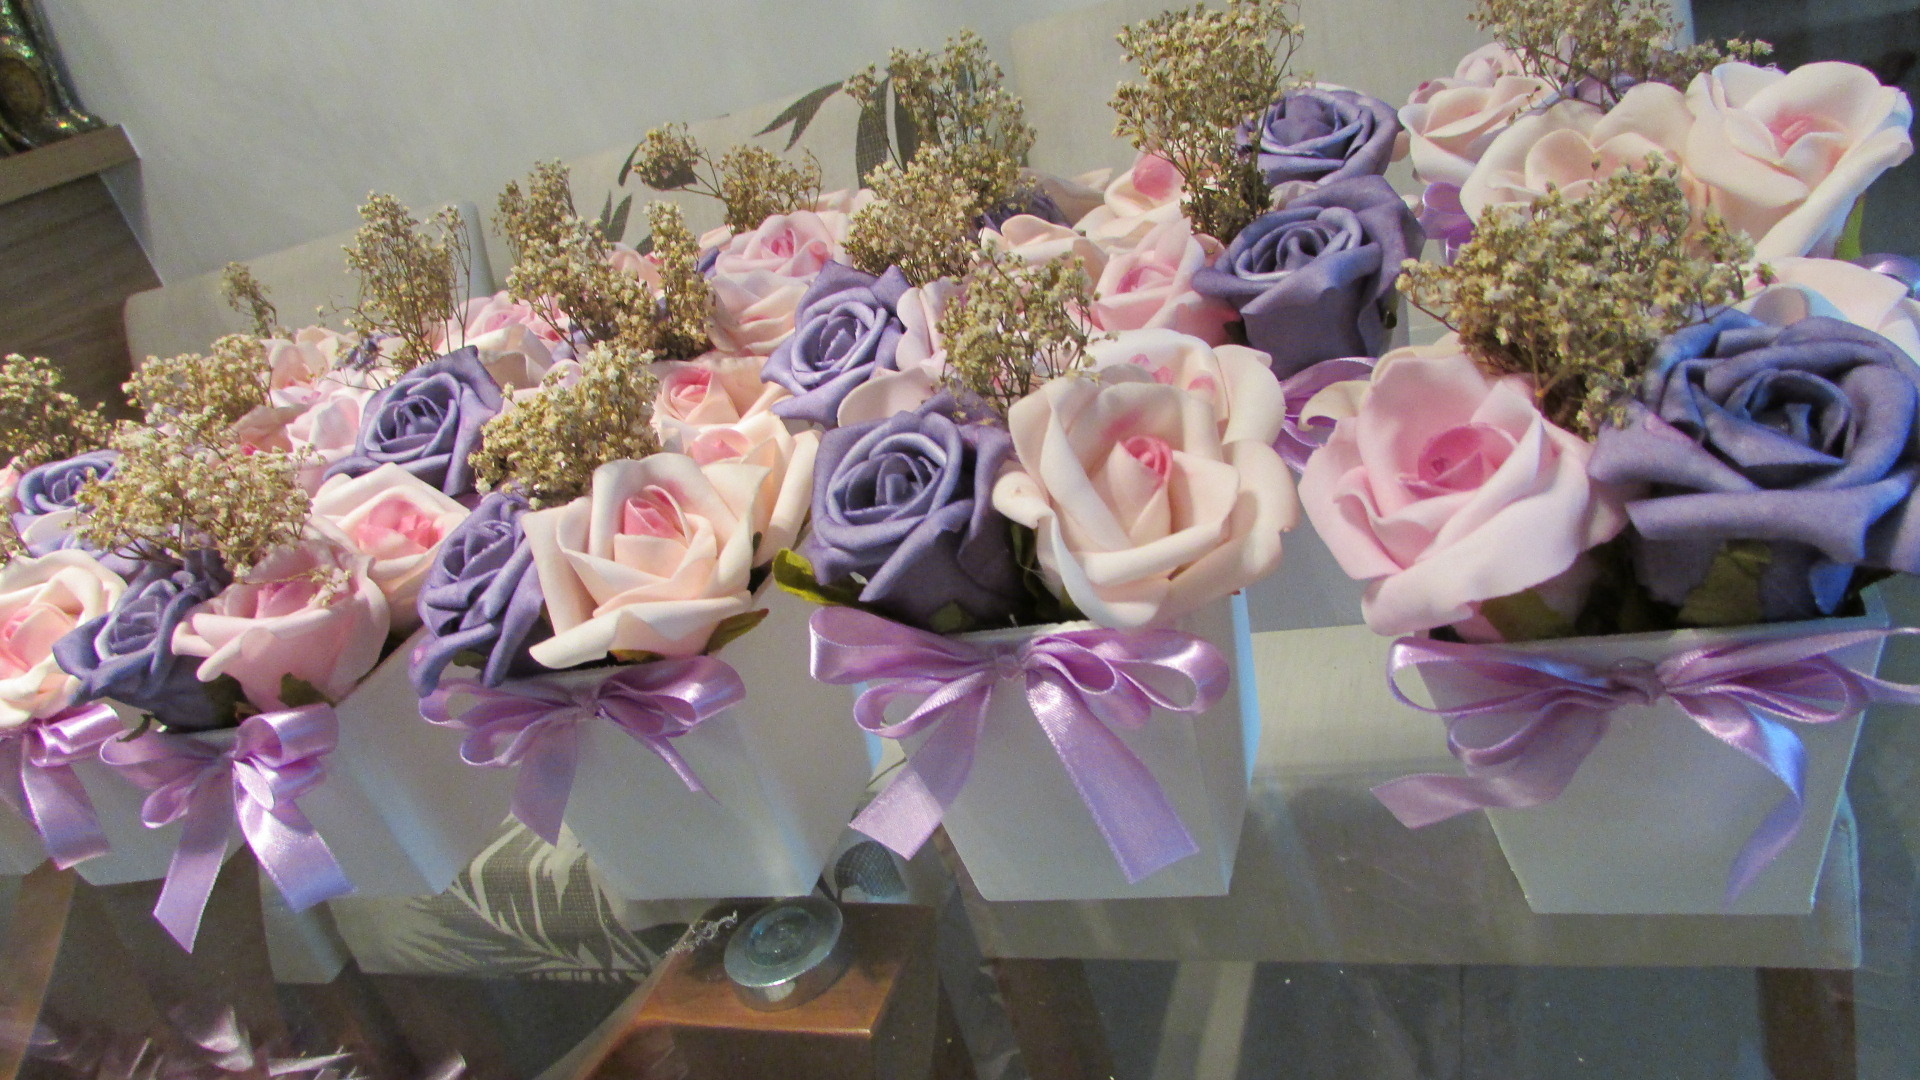 kit-casamento-bouquet-vasinhos-di-alex-centro-mesa-casamento.jpg